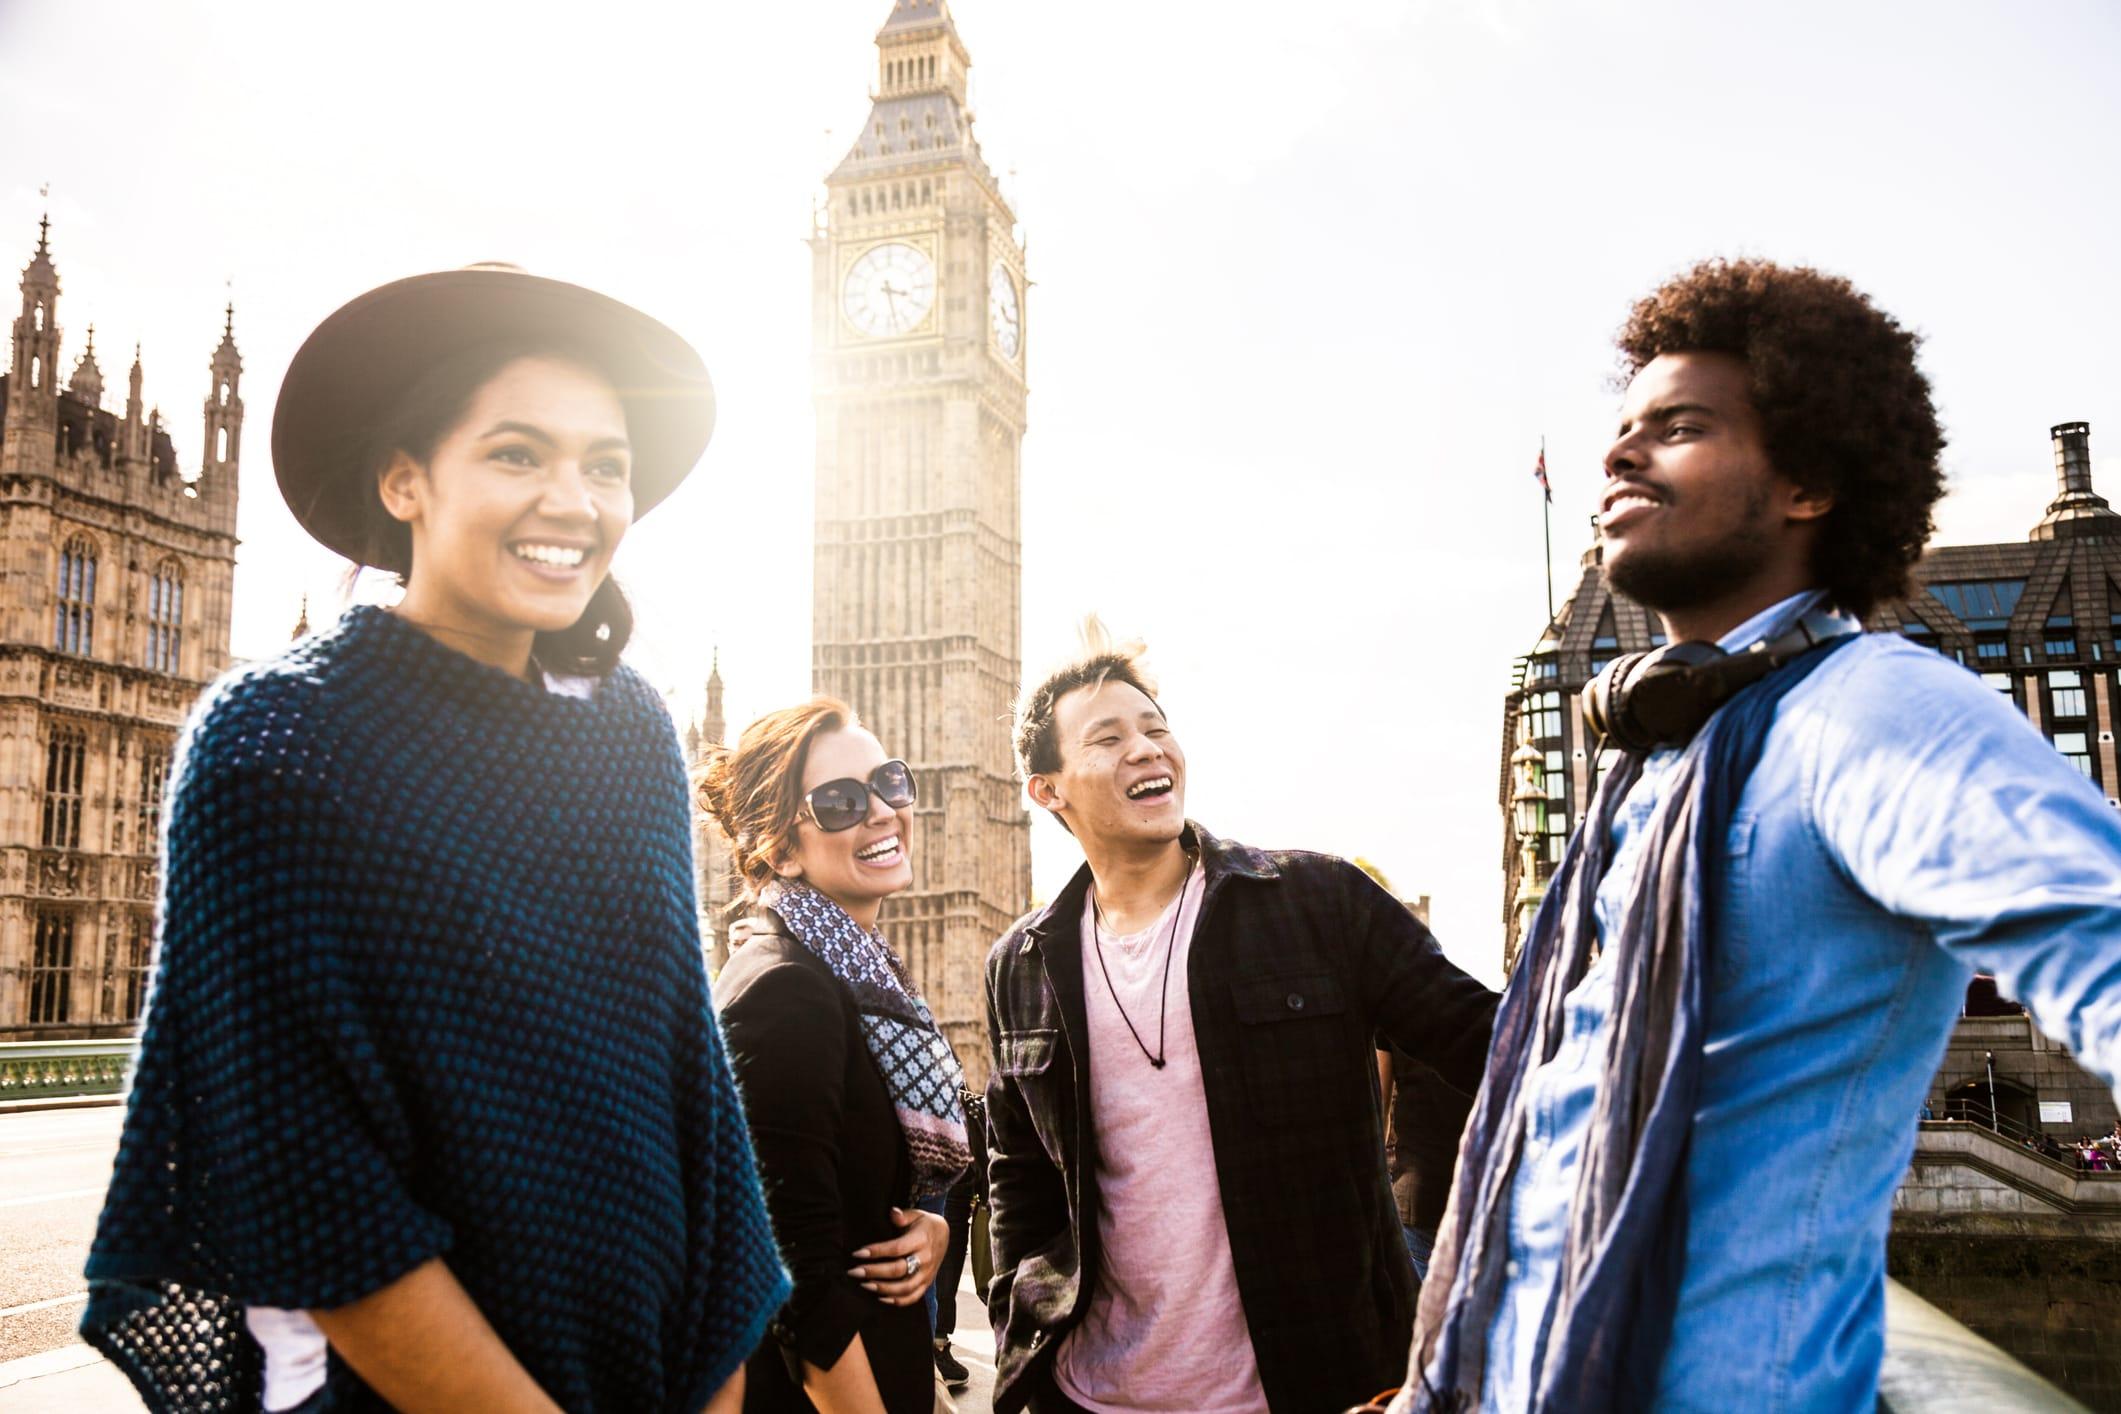 London travelers